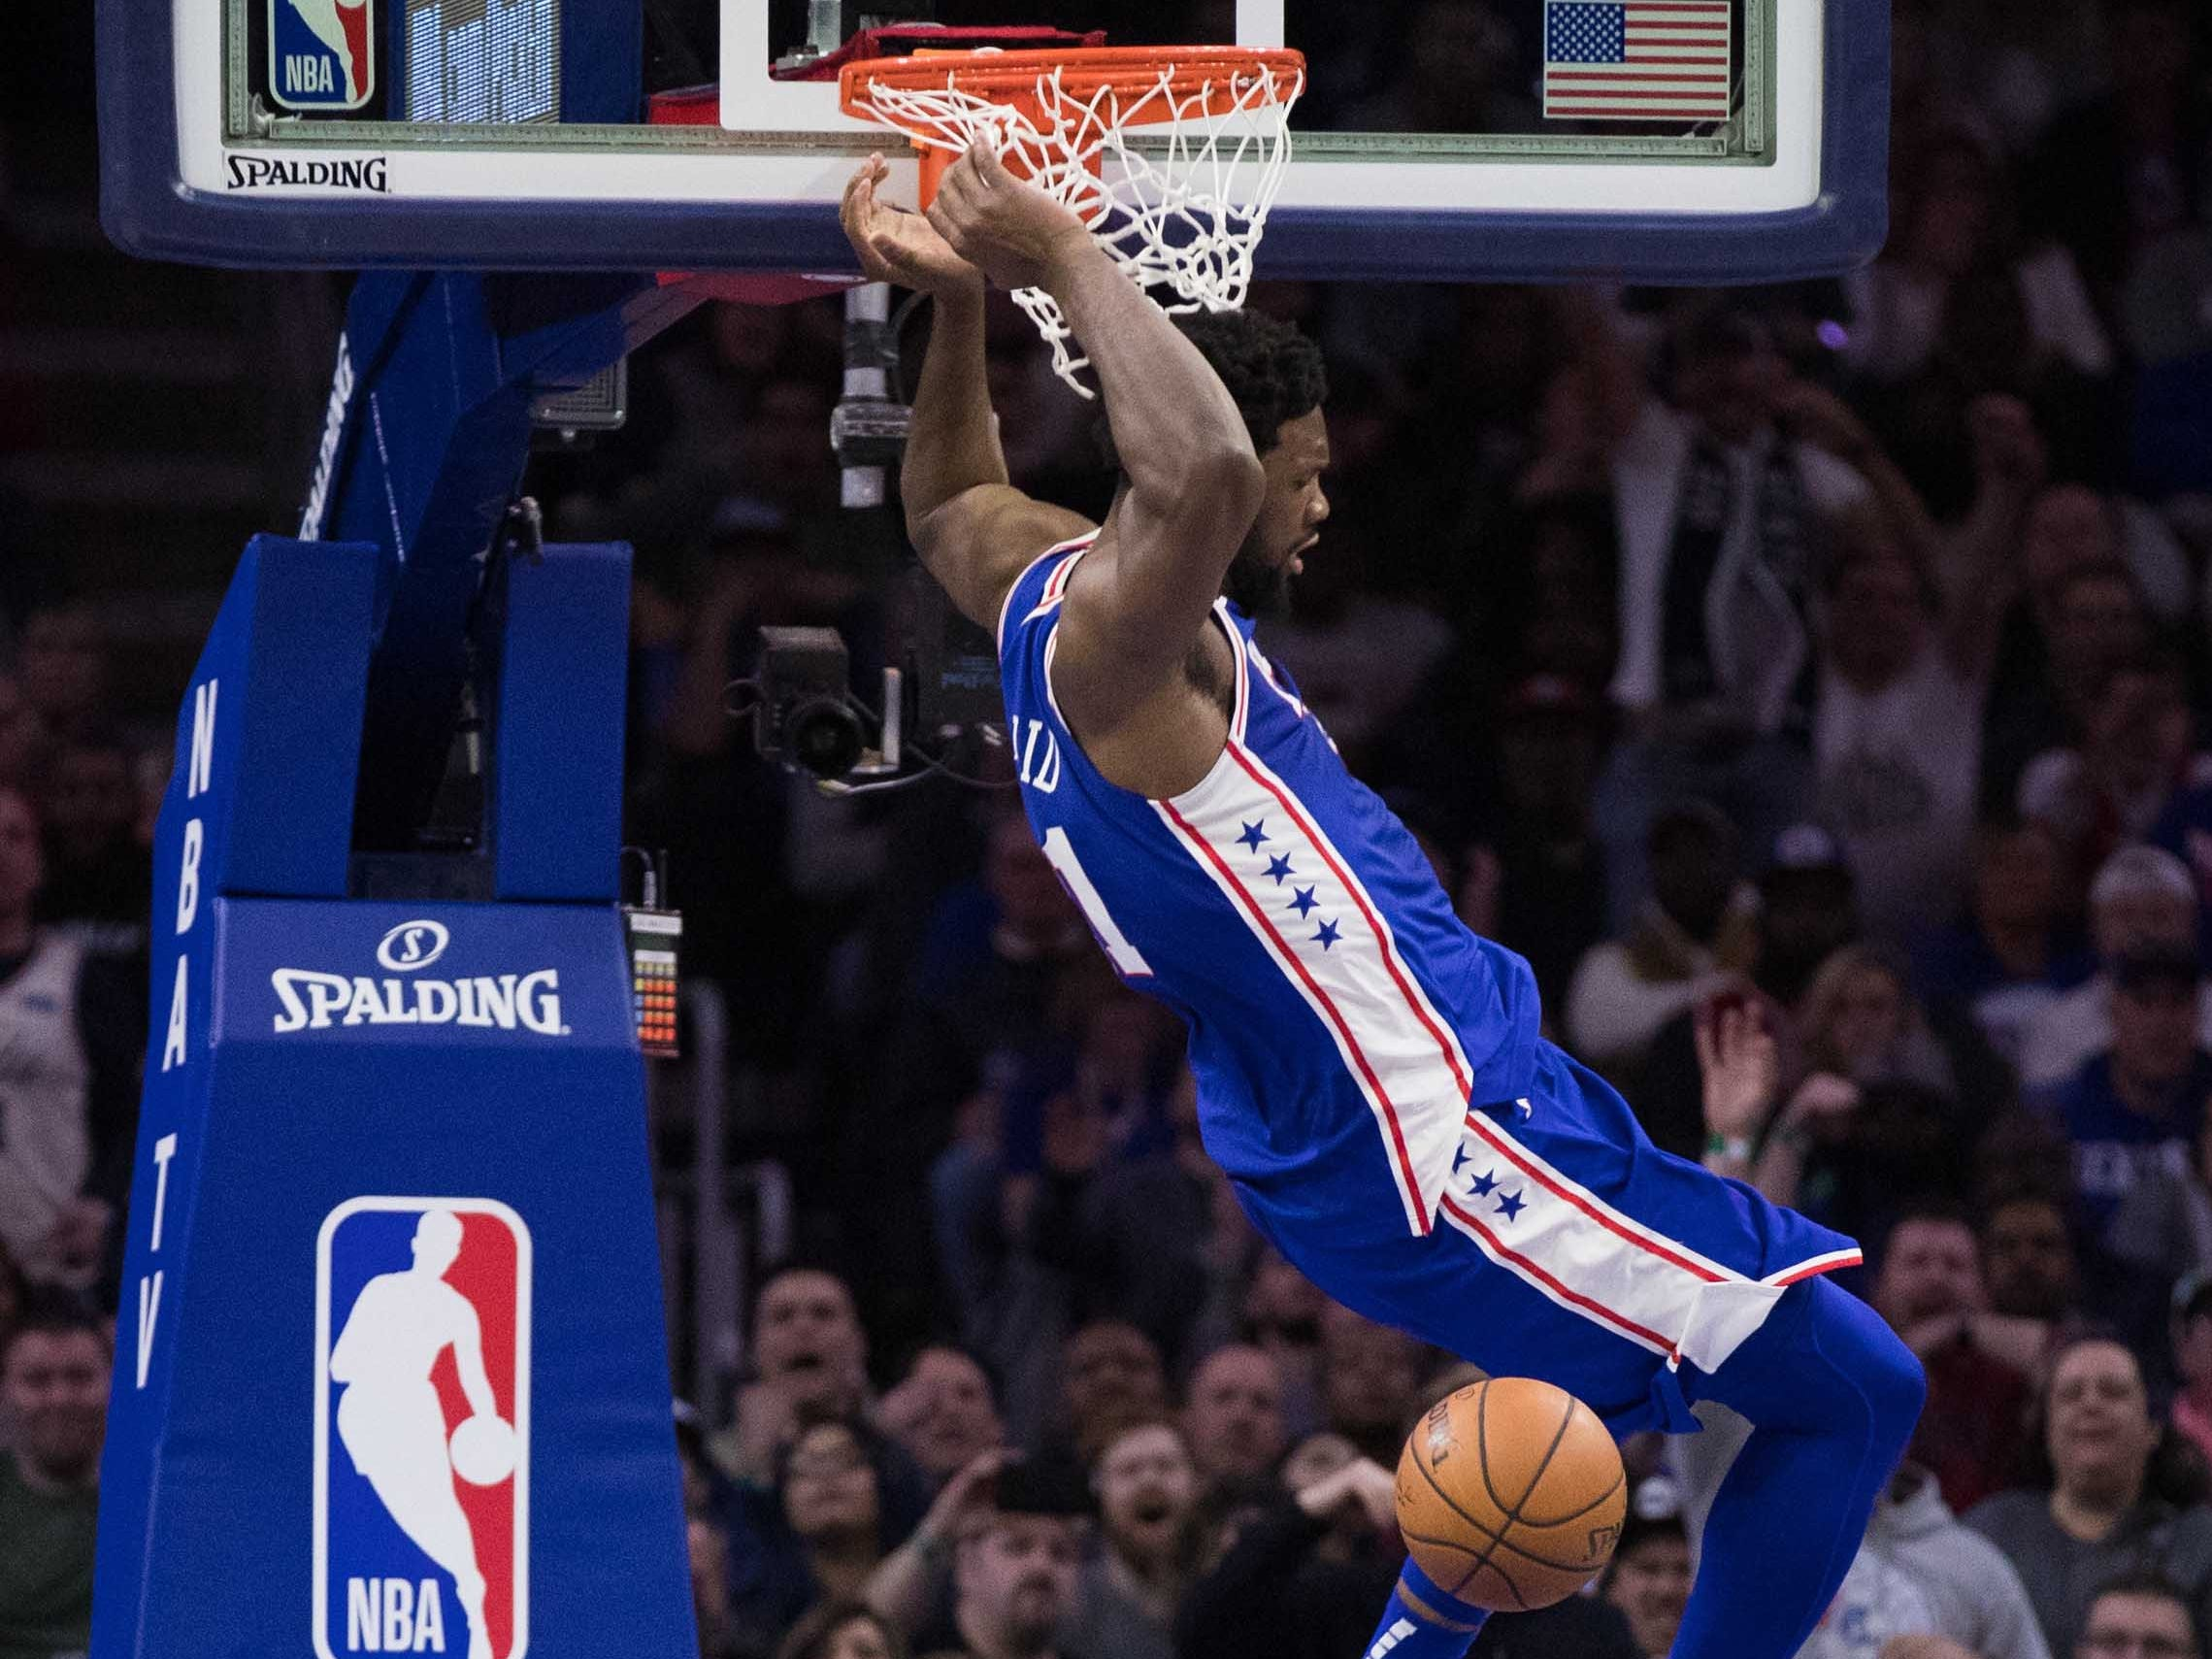 March 20: Philadelphia 76ers center Joel Embiid dunks on top of Boston Celtics forward Marcus Morris during the third quarter at Wells Fargo Center.